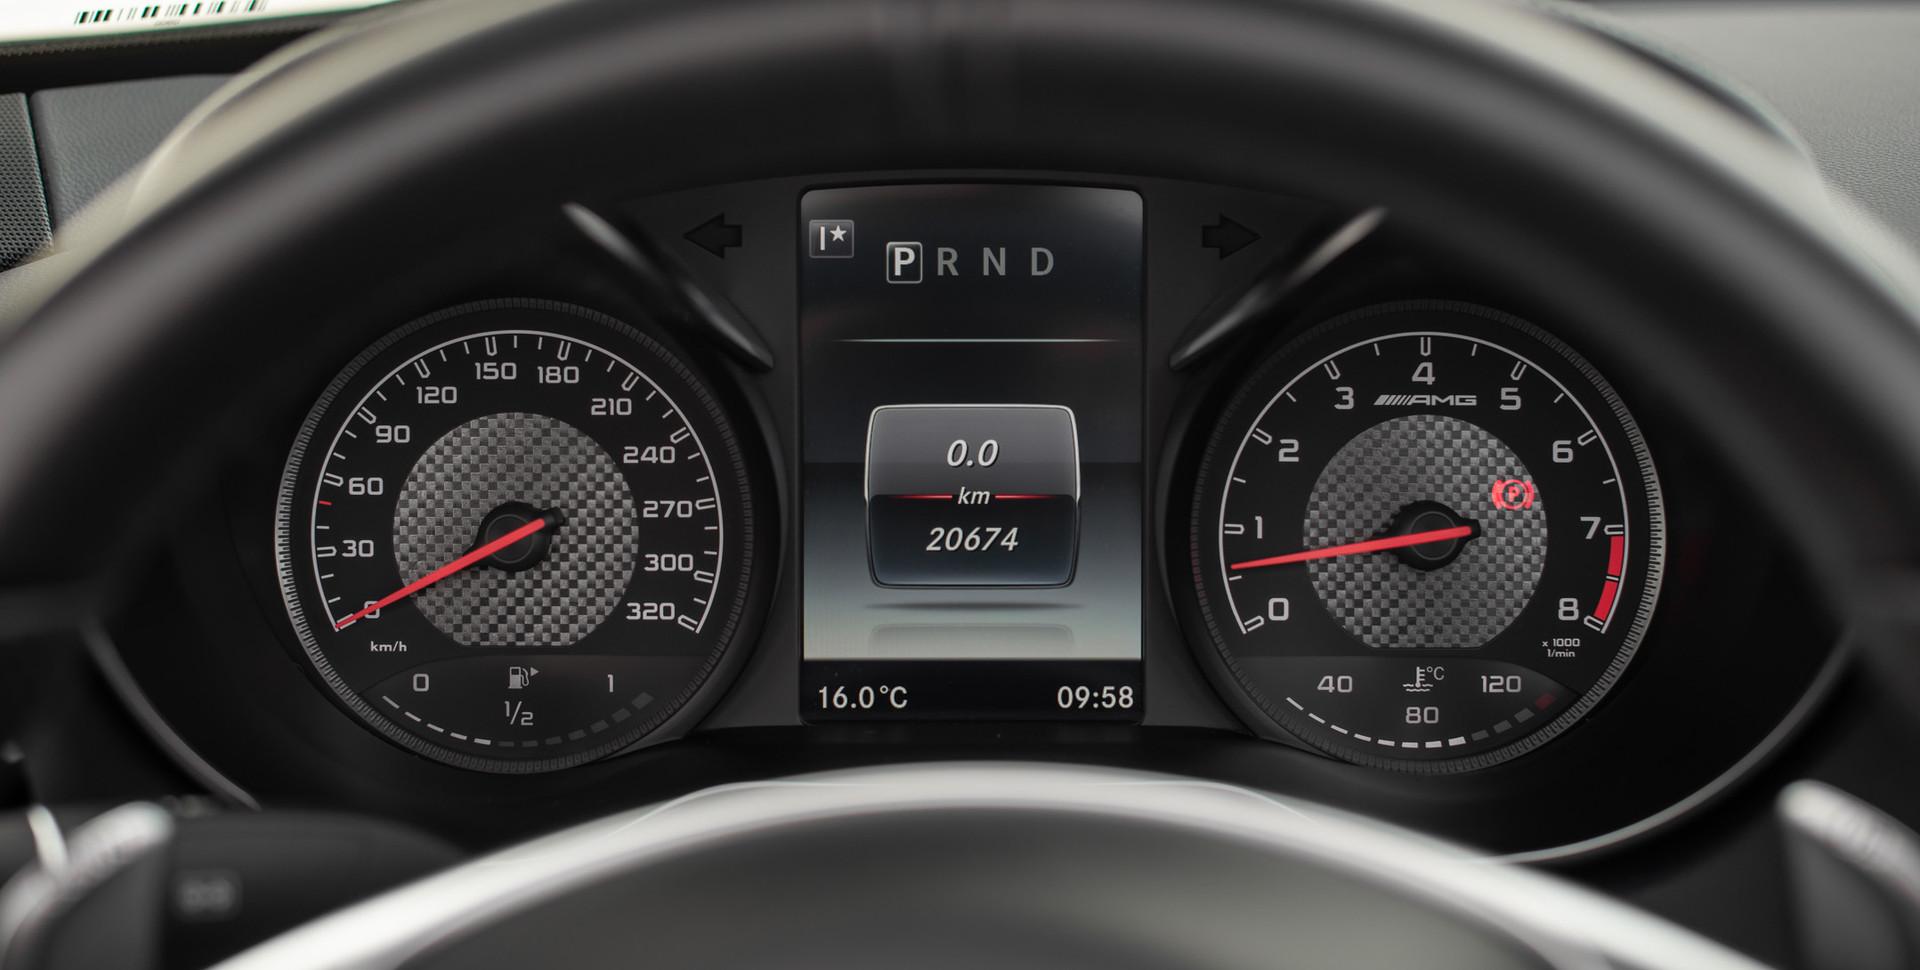 MB AMG GT Cabrio-17.jpg.JPG